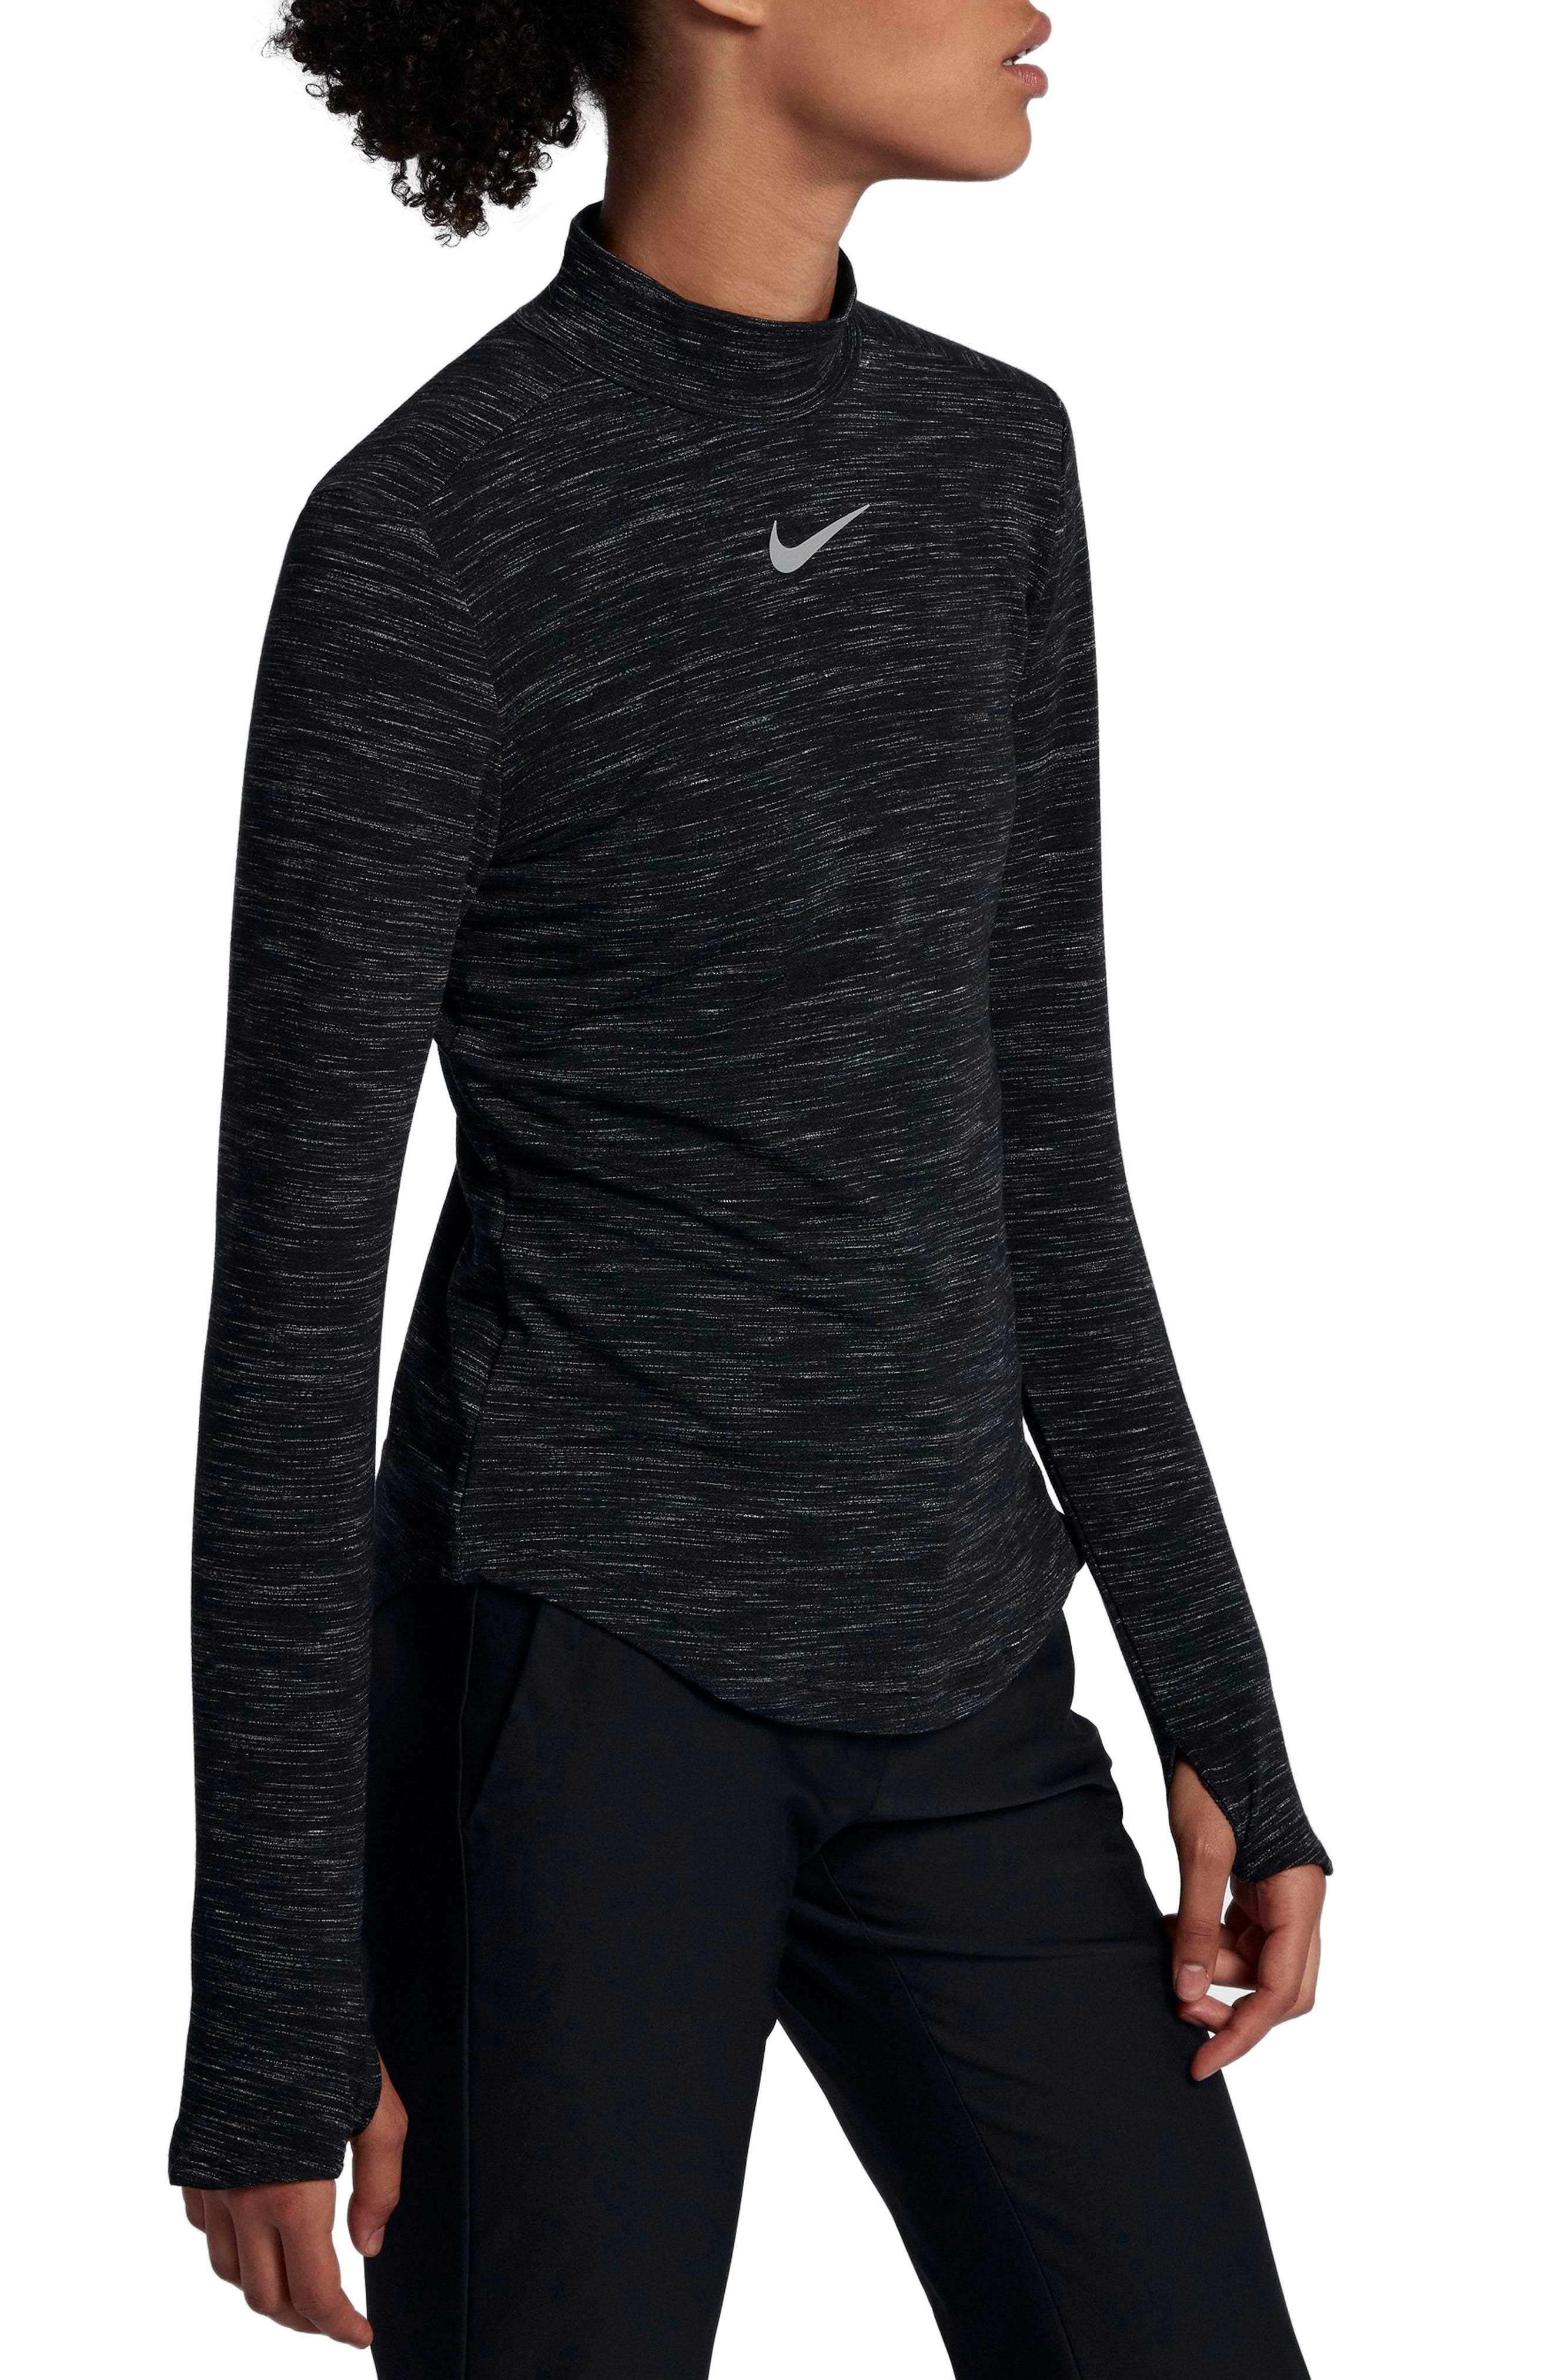 Nike Dry Long Sleeve Golf Top